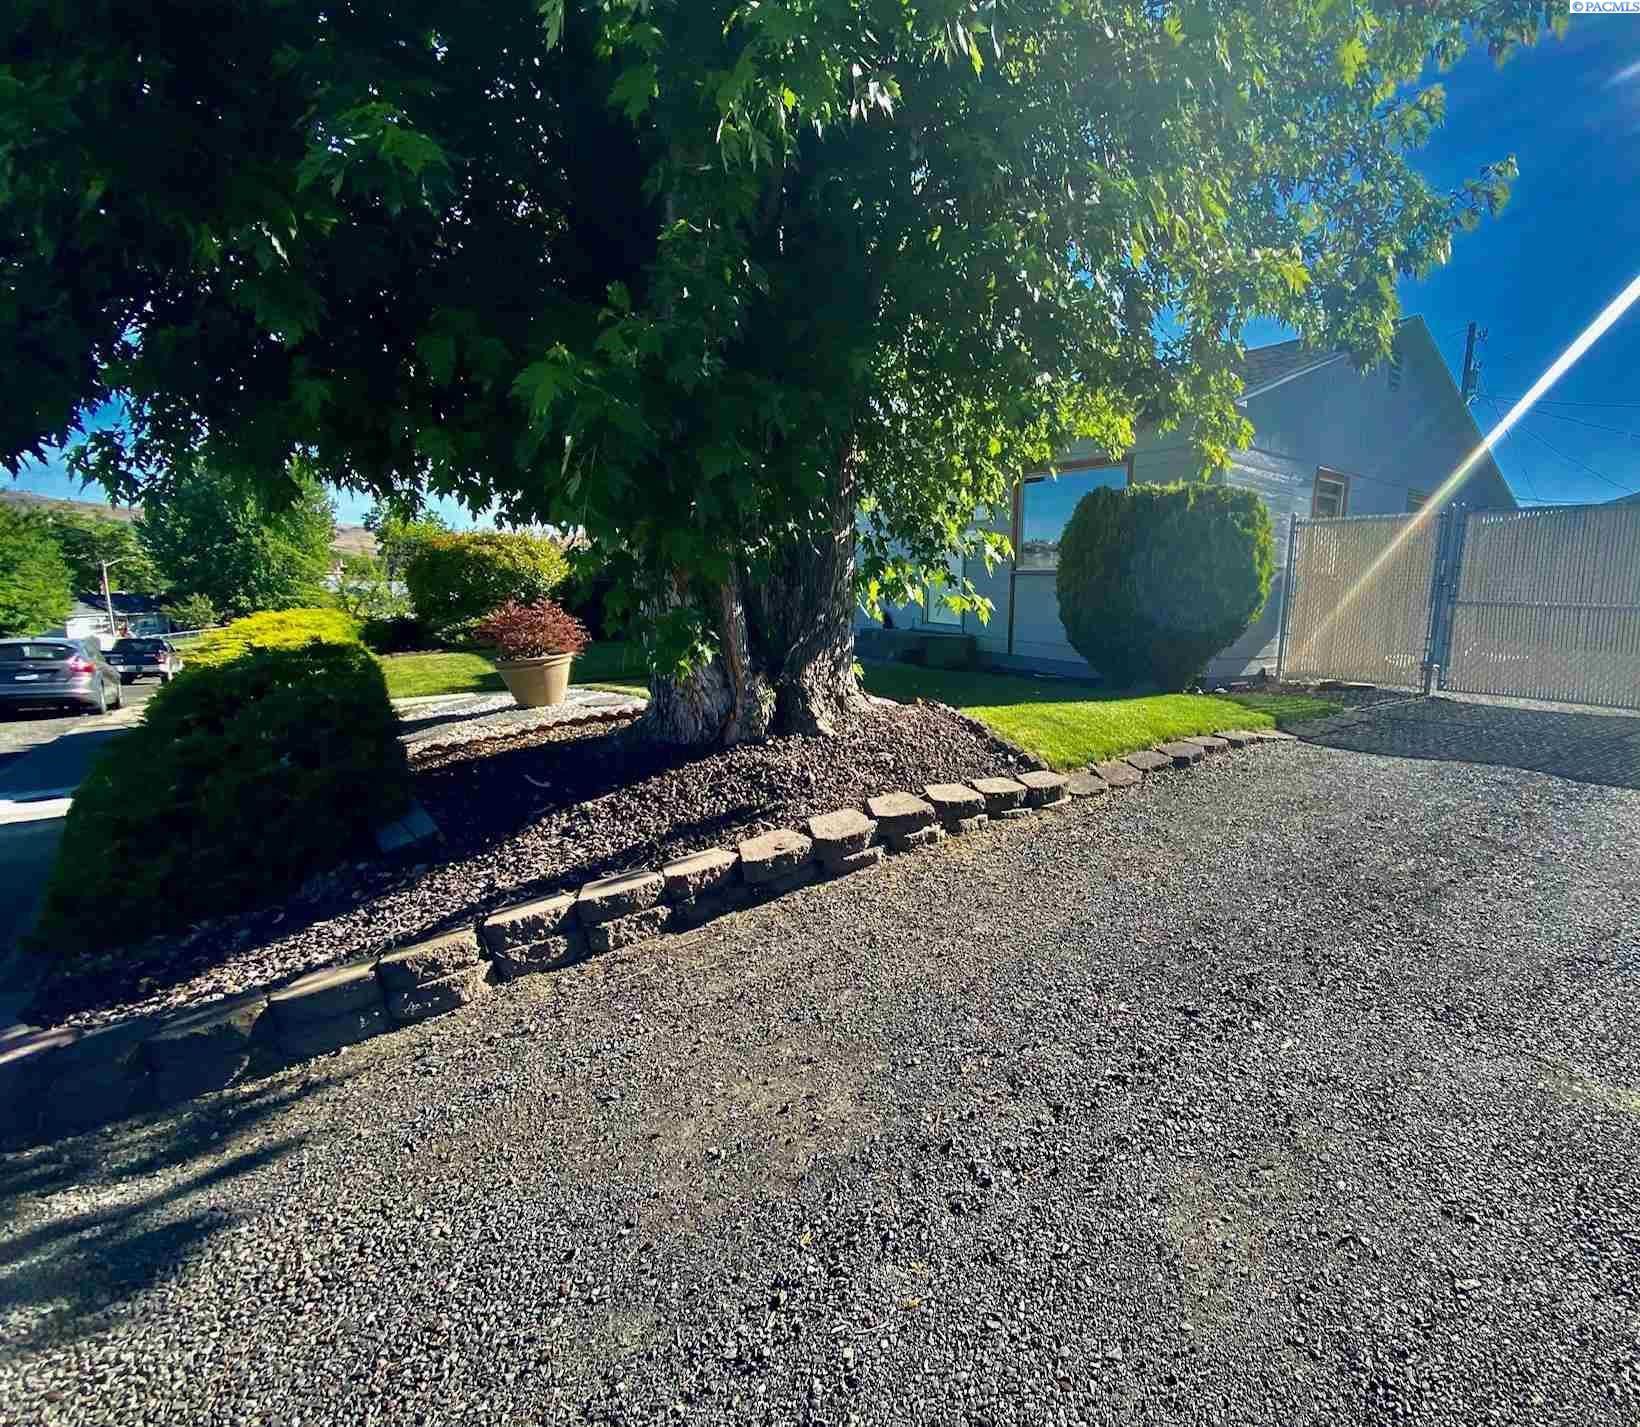 Photo of 1510 Sunrise Dr, Clarkston, WA 99403 (MLS # 254239)